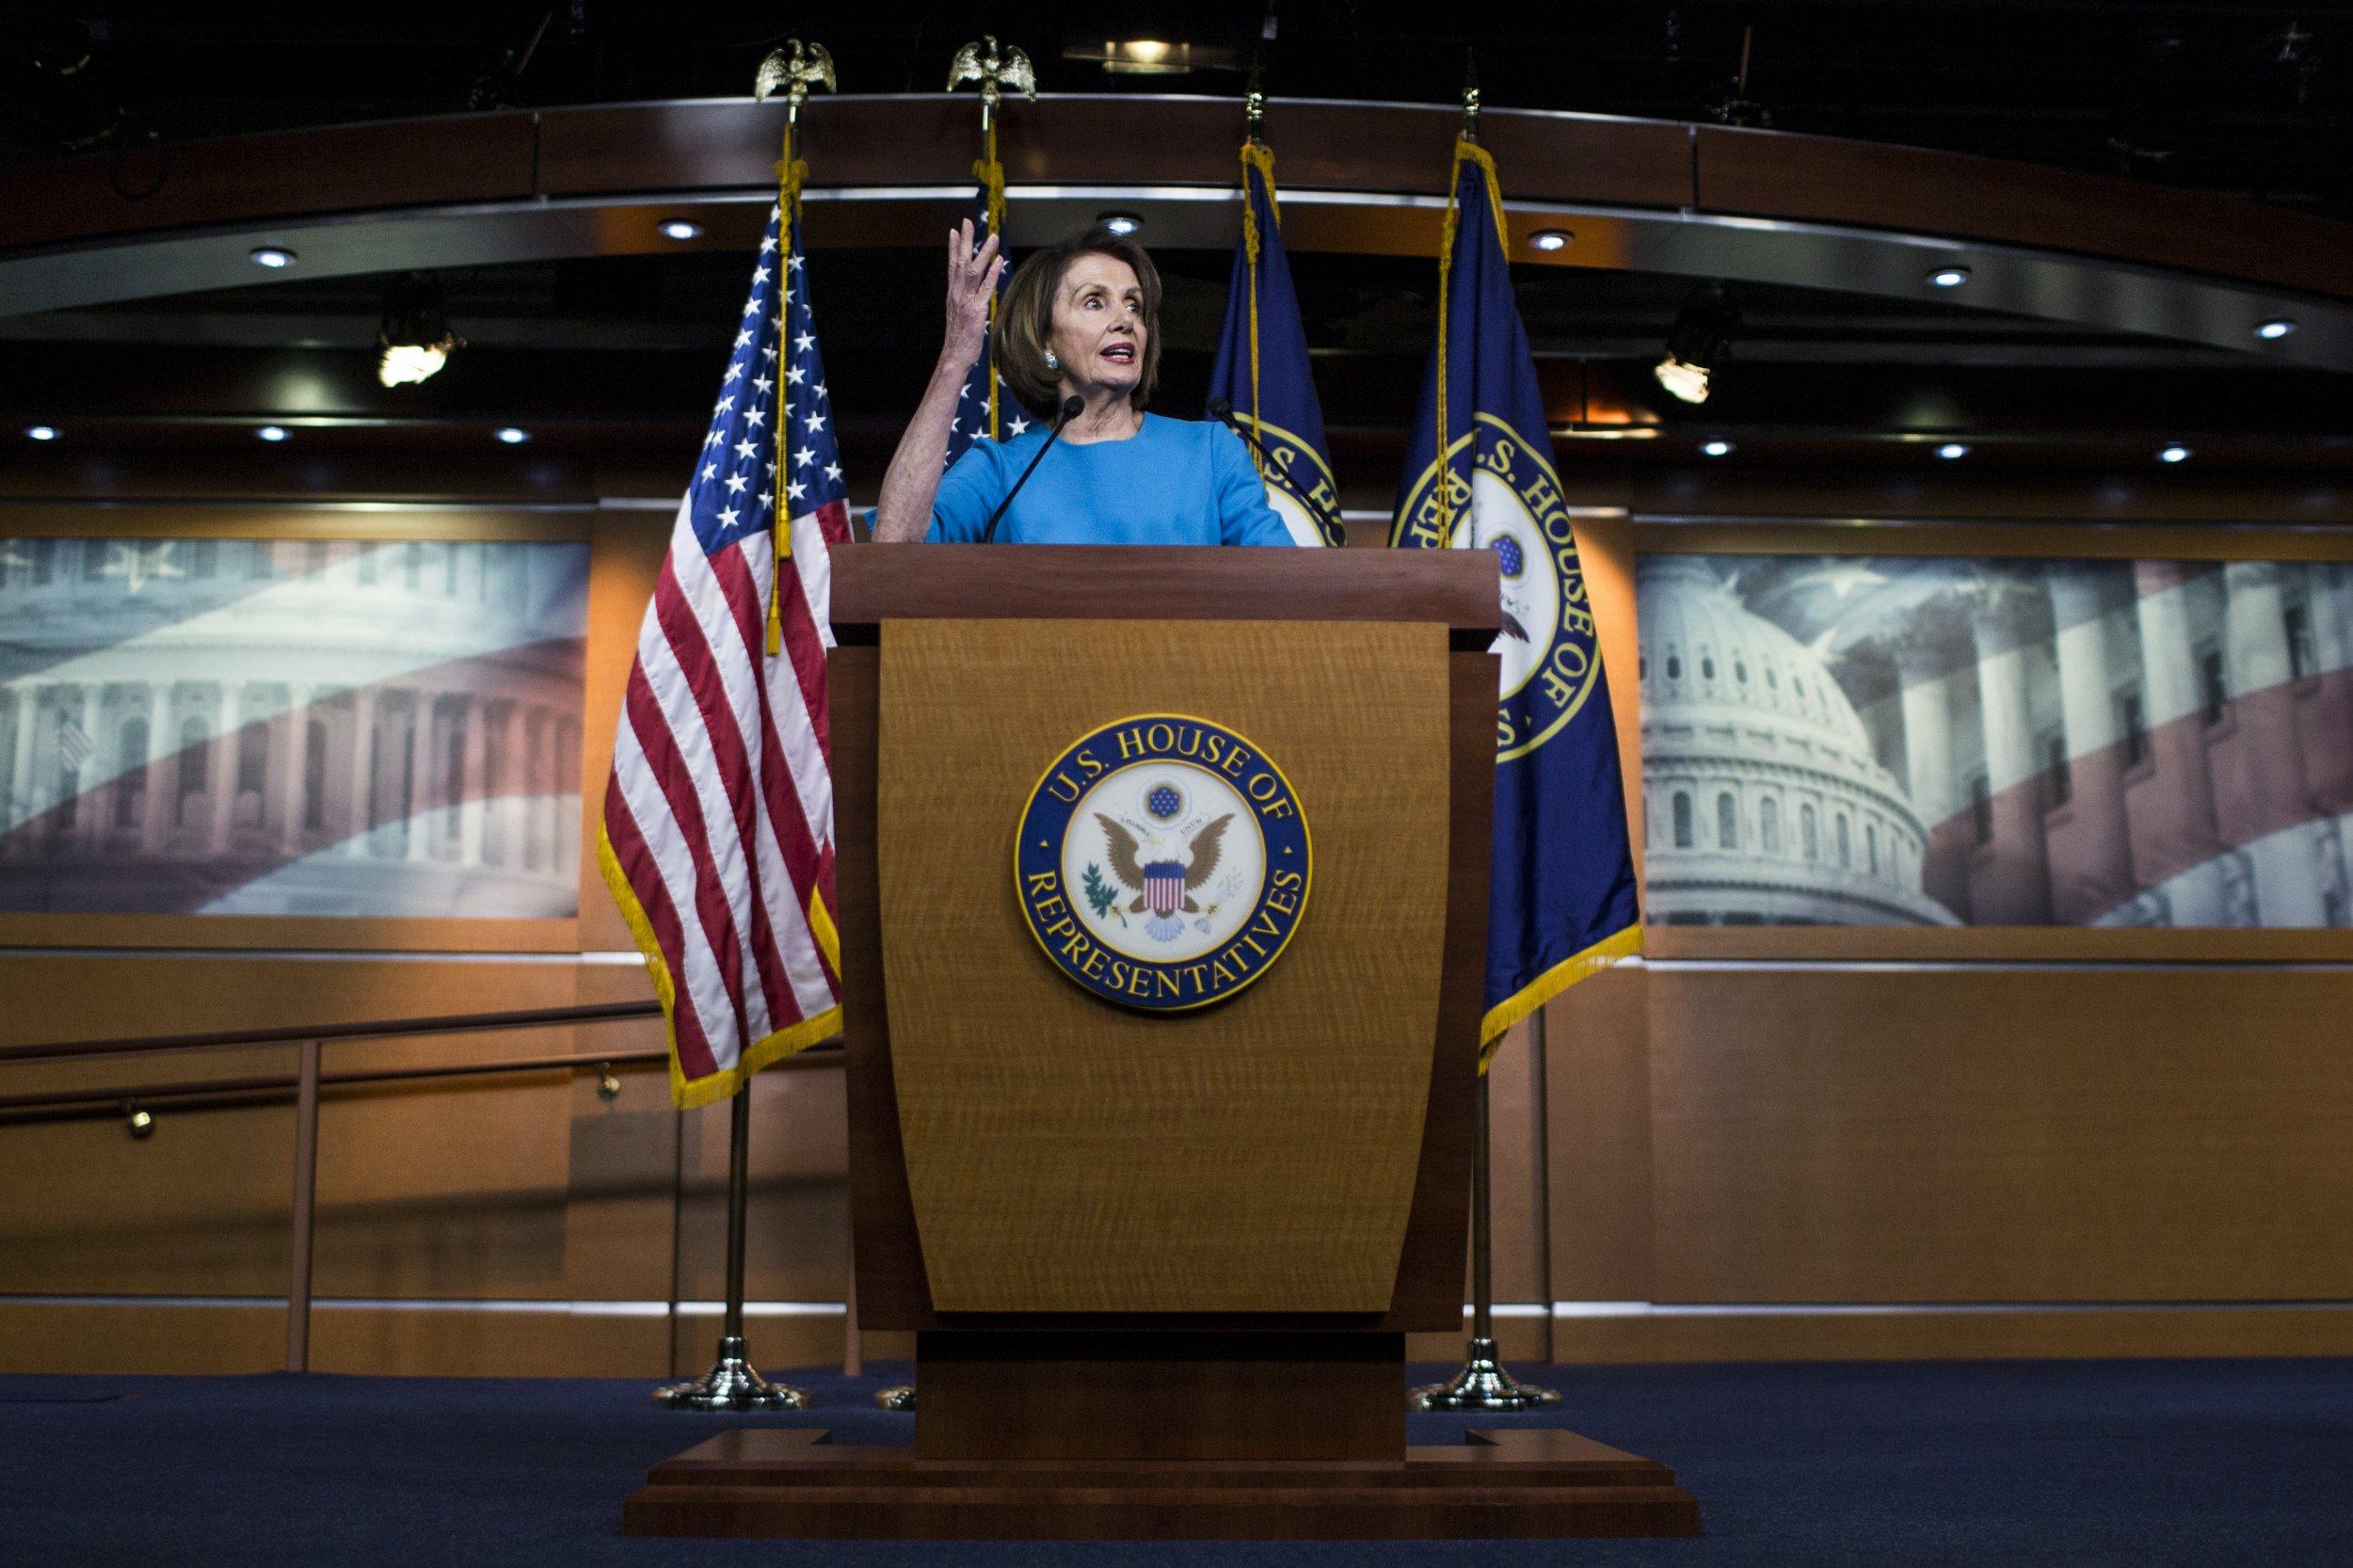 Nancy Pelosi Trump stonewalling beneath dignity of presidency